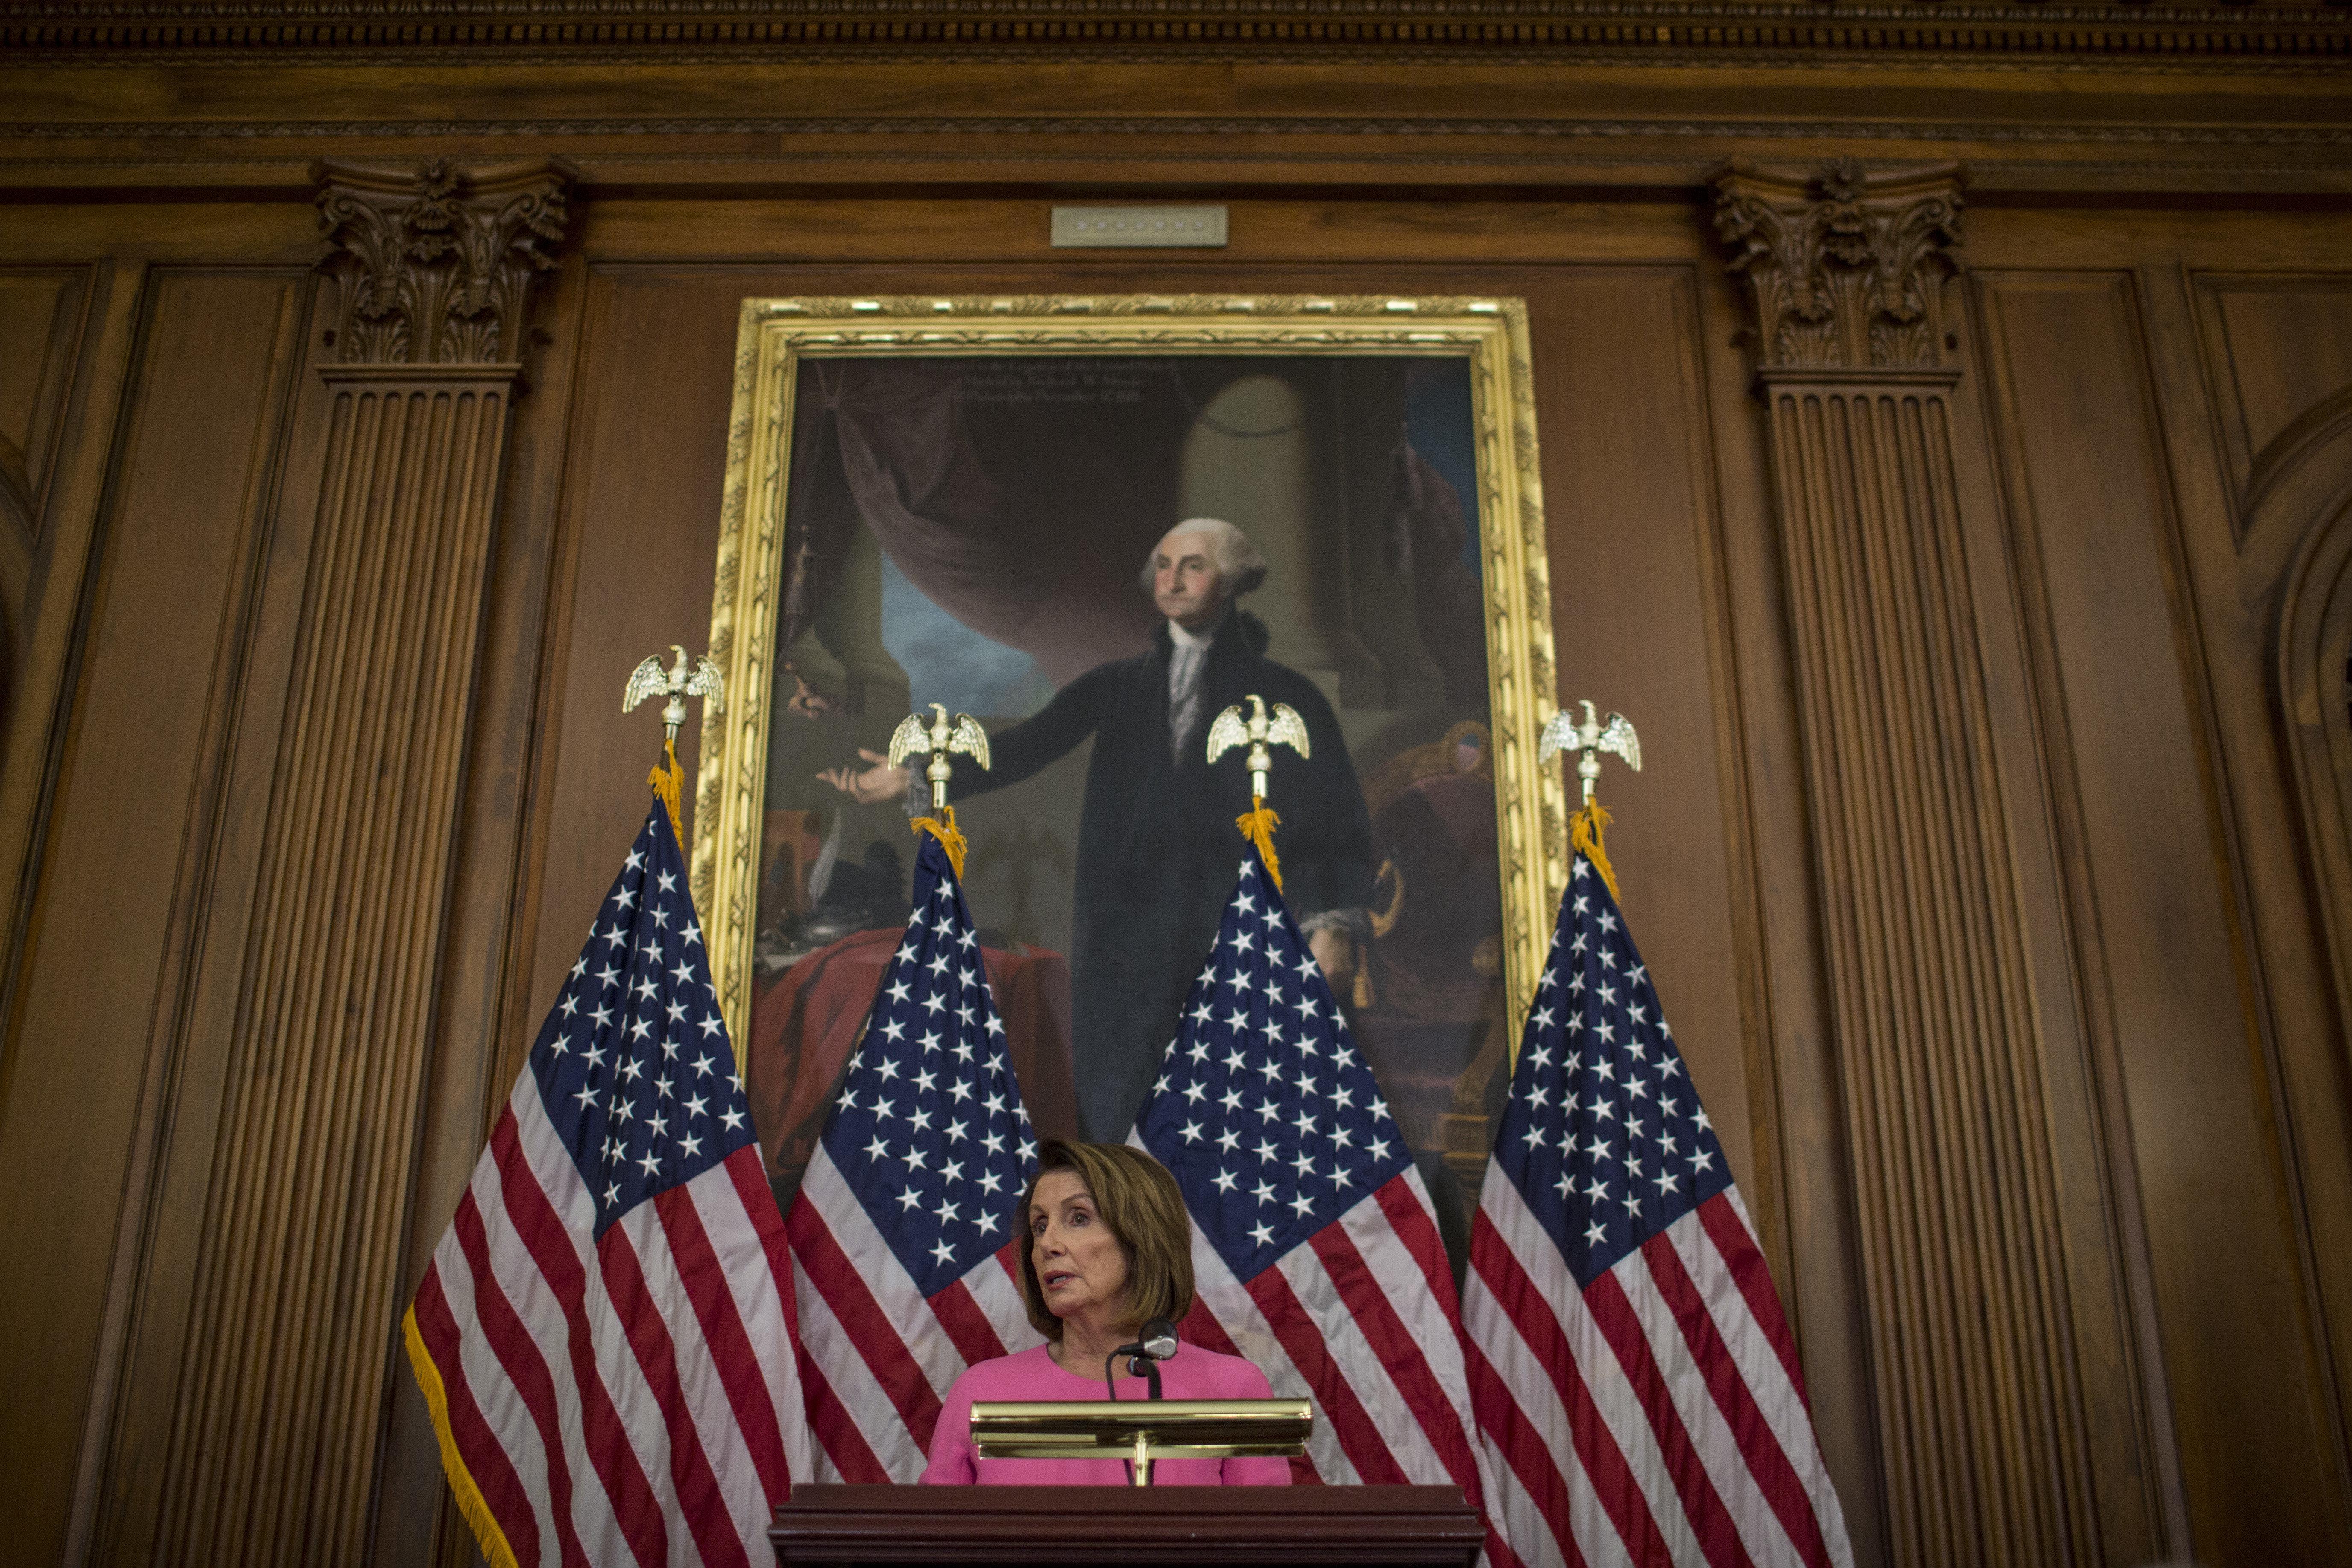 Westlake Legal Group 5c422b50200000d4006bbae5 Nancy Pelosi Cancels Overseas Trip After Accusing Trump Of Leaking Travel Plans